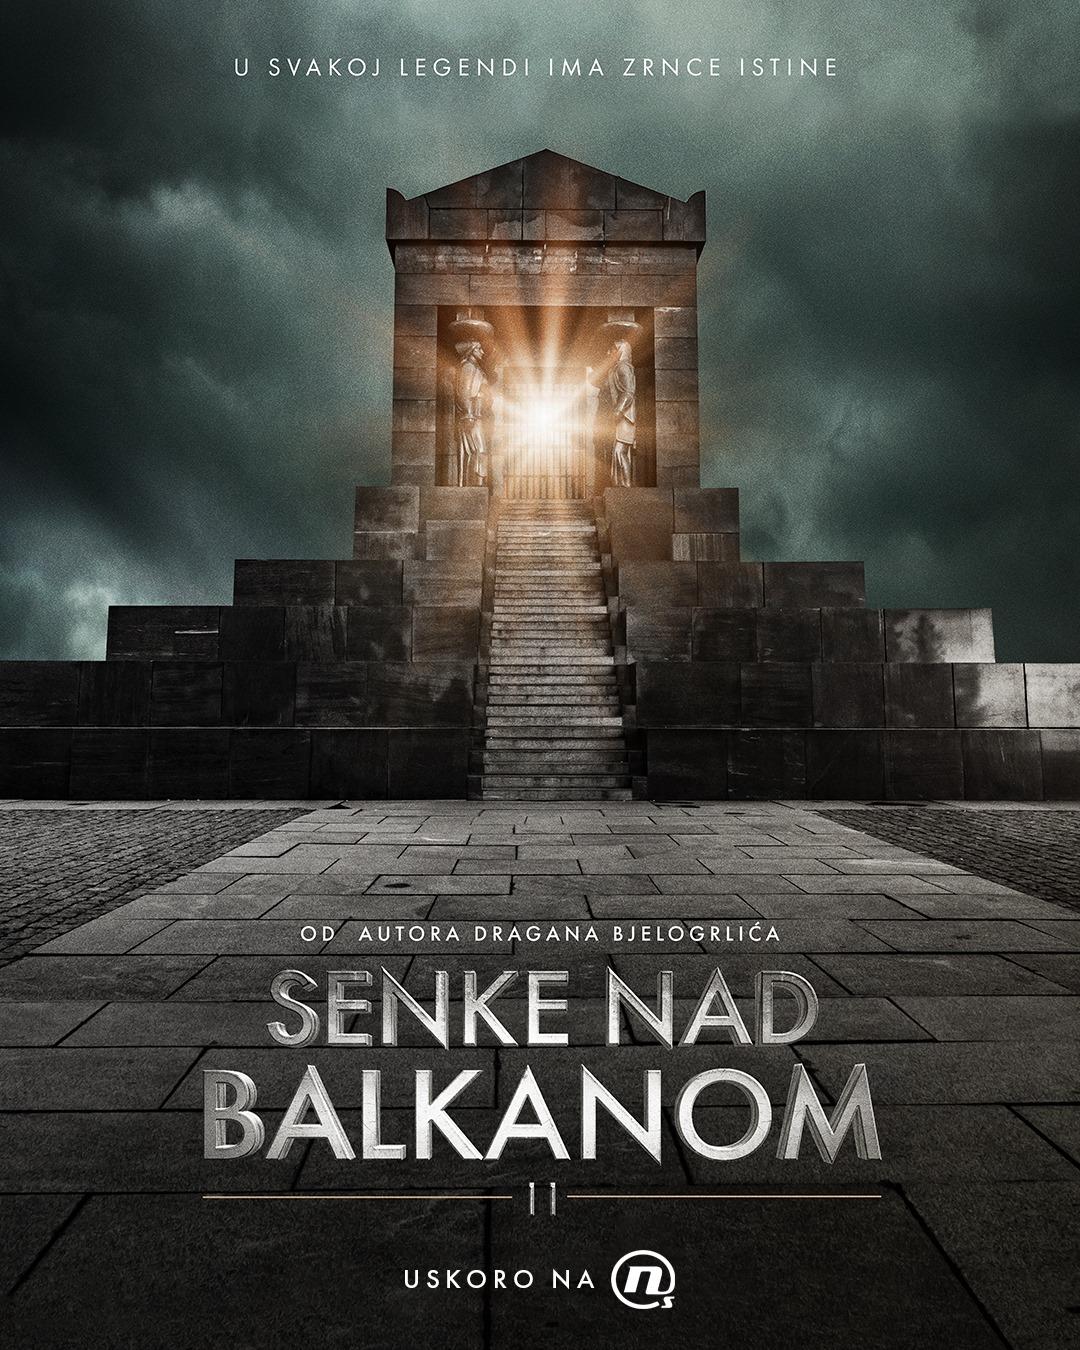 Senke nad Balkanom (2. sezona) — Vikipedija, slobodna enciklopedija